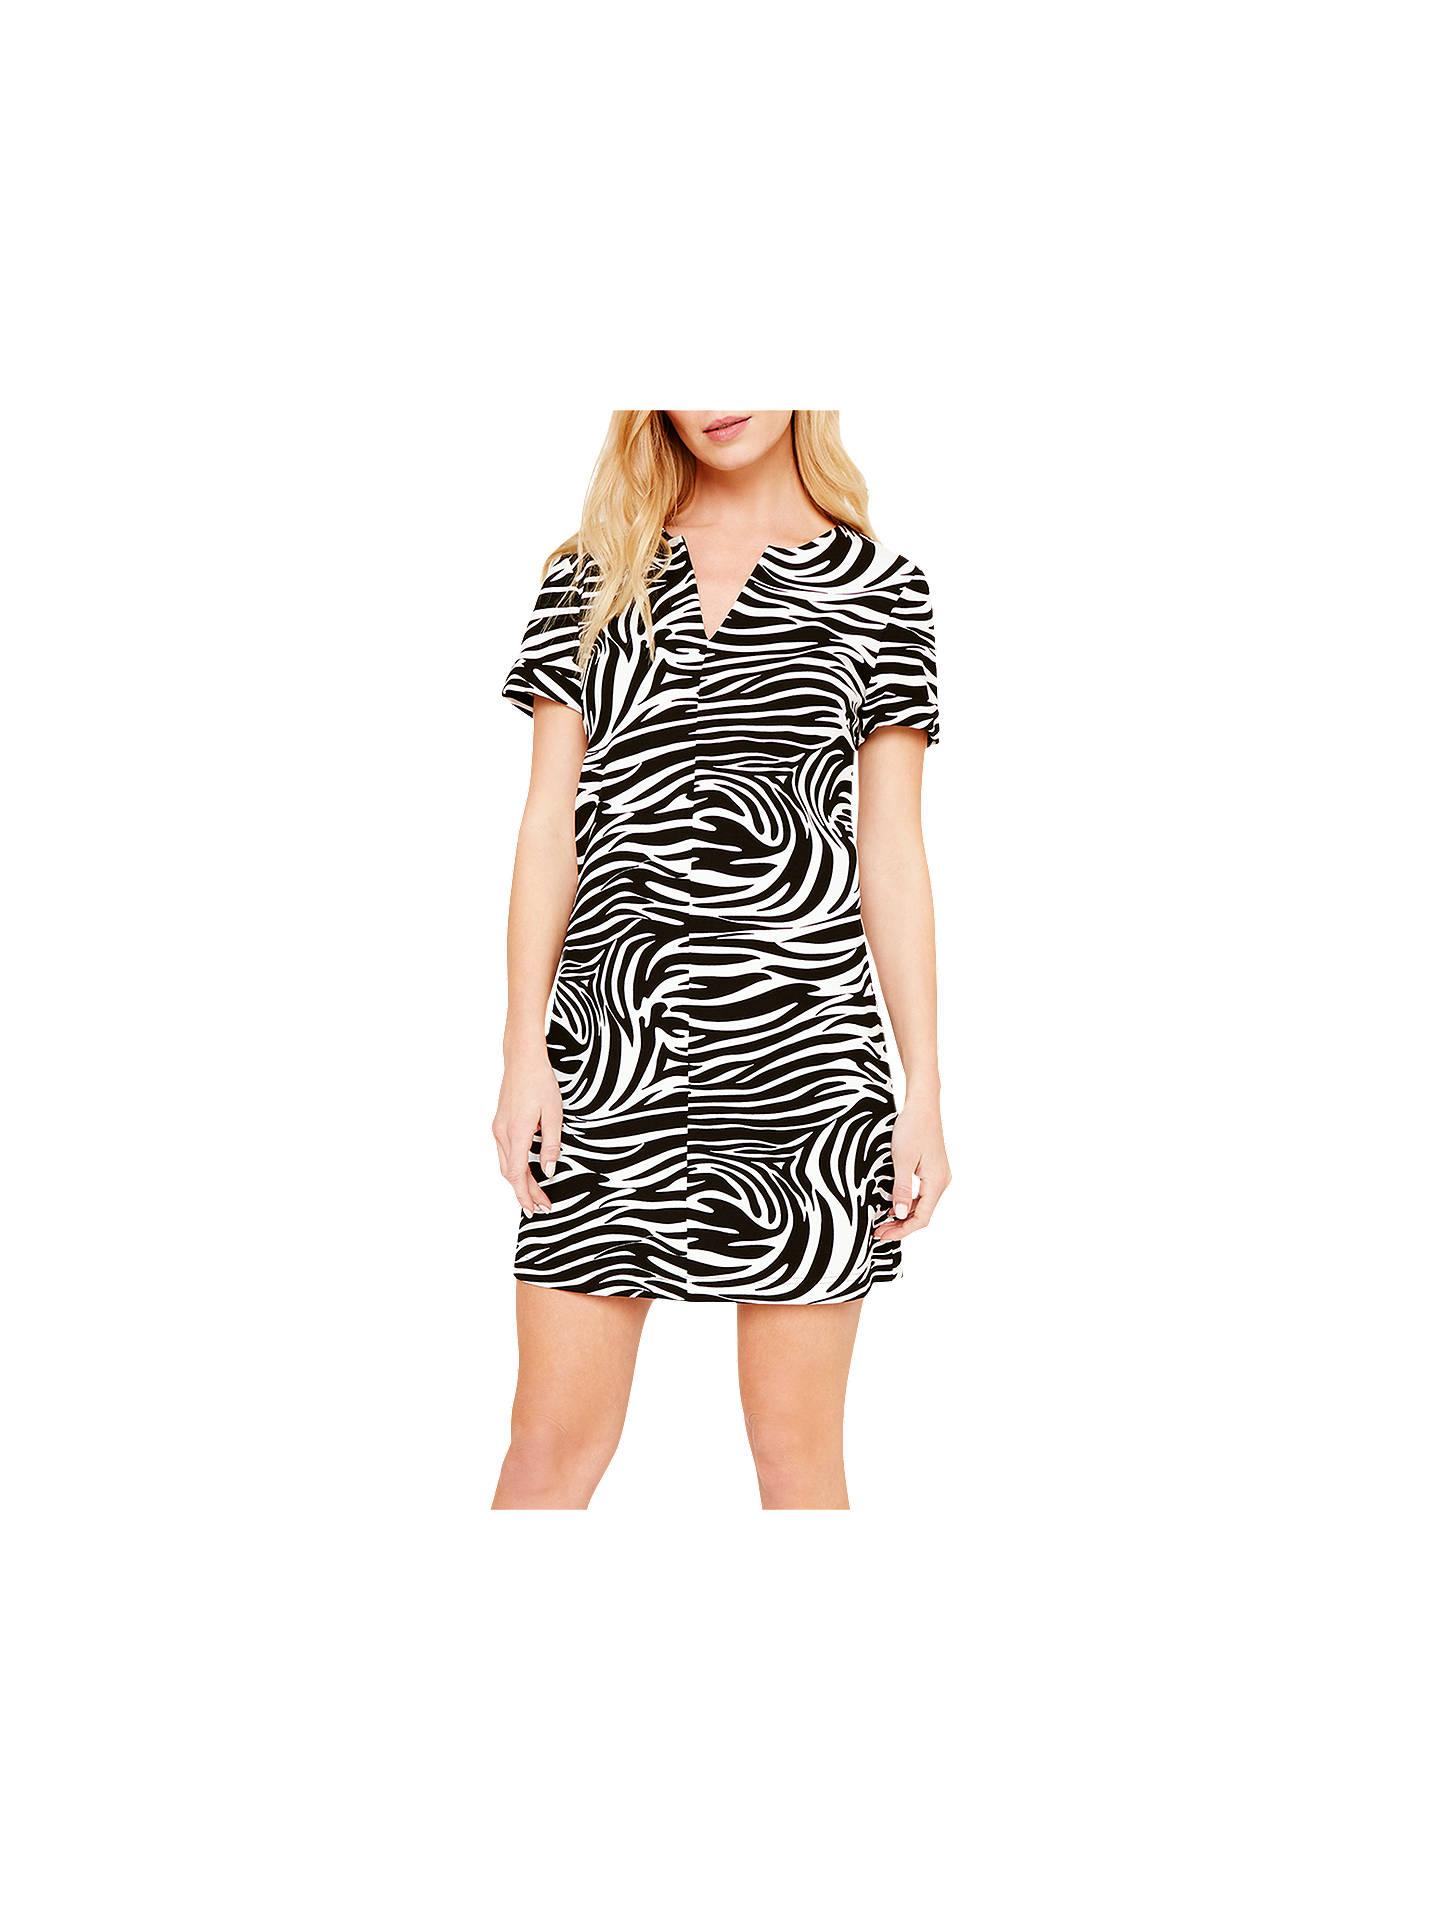 ddeb31d1fc1 Buy Damsel in a Dress Zebra Print Tunic Dress, Black/White, 8 Online ...